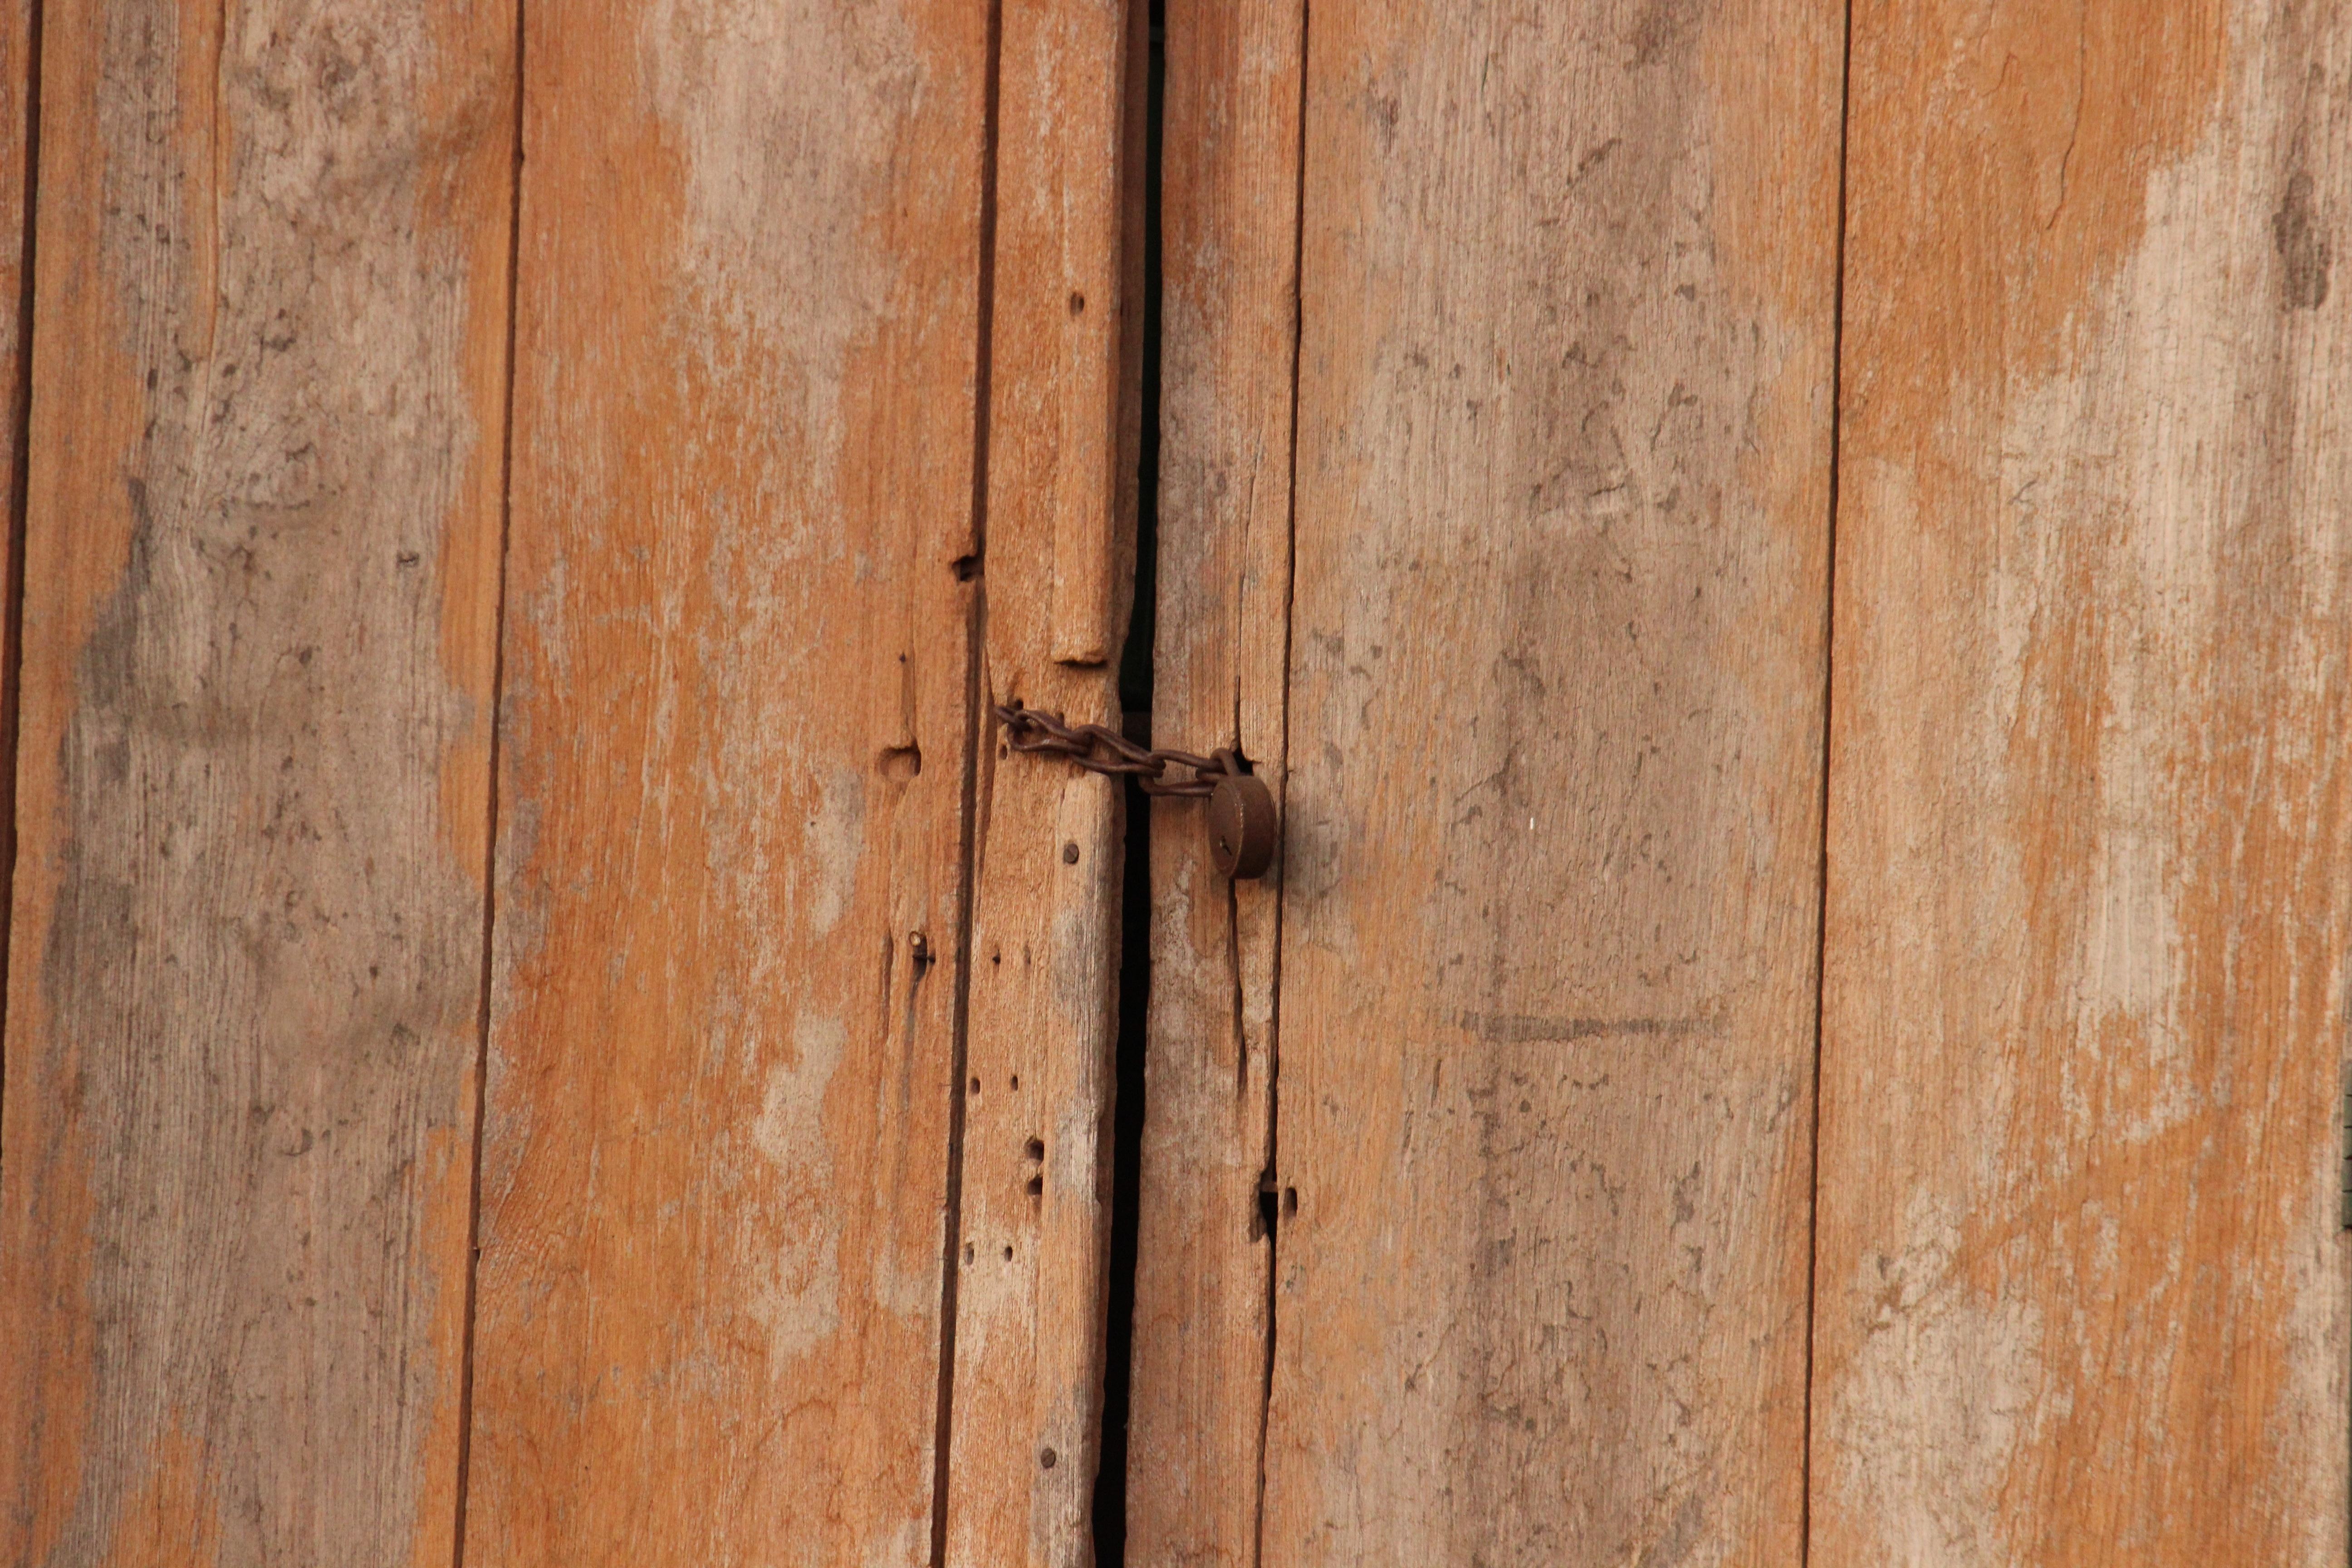 holz textur planke stock mauer holz tr hartholz bodenbelag holzboden mann machte objekt laminatboden holzbeize - Hartholz Oder Laminatboden